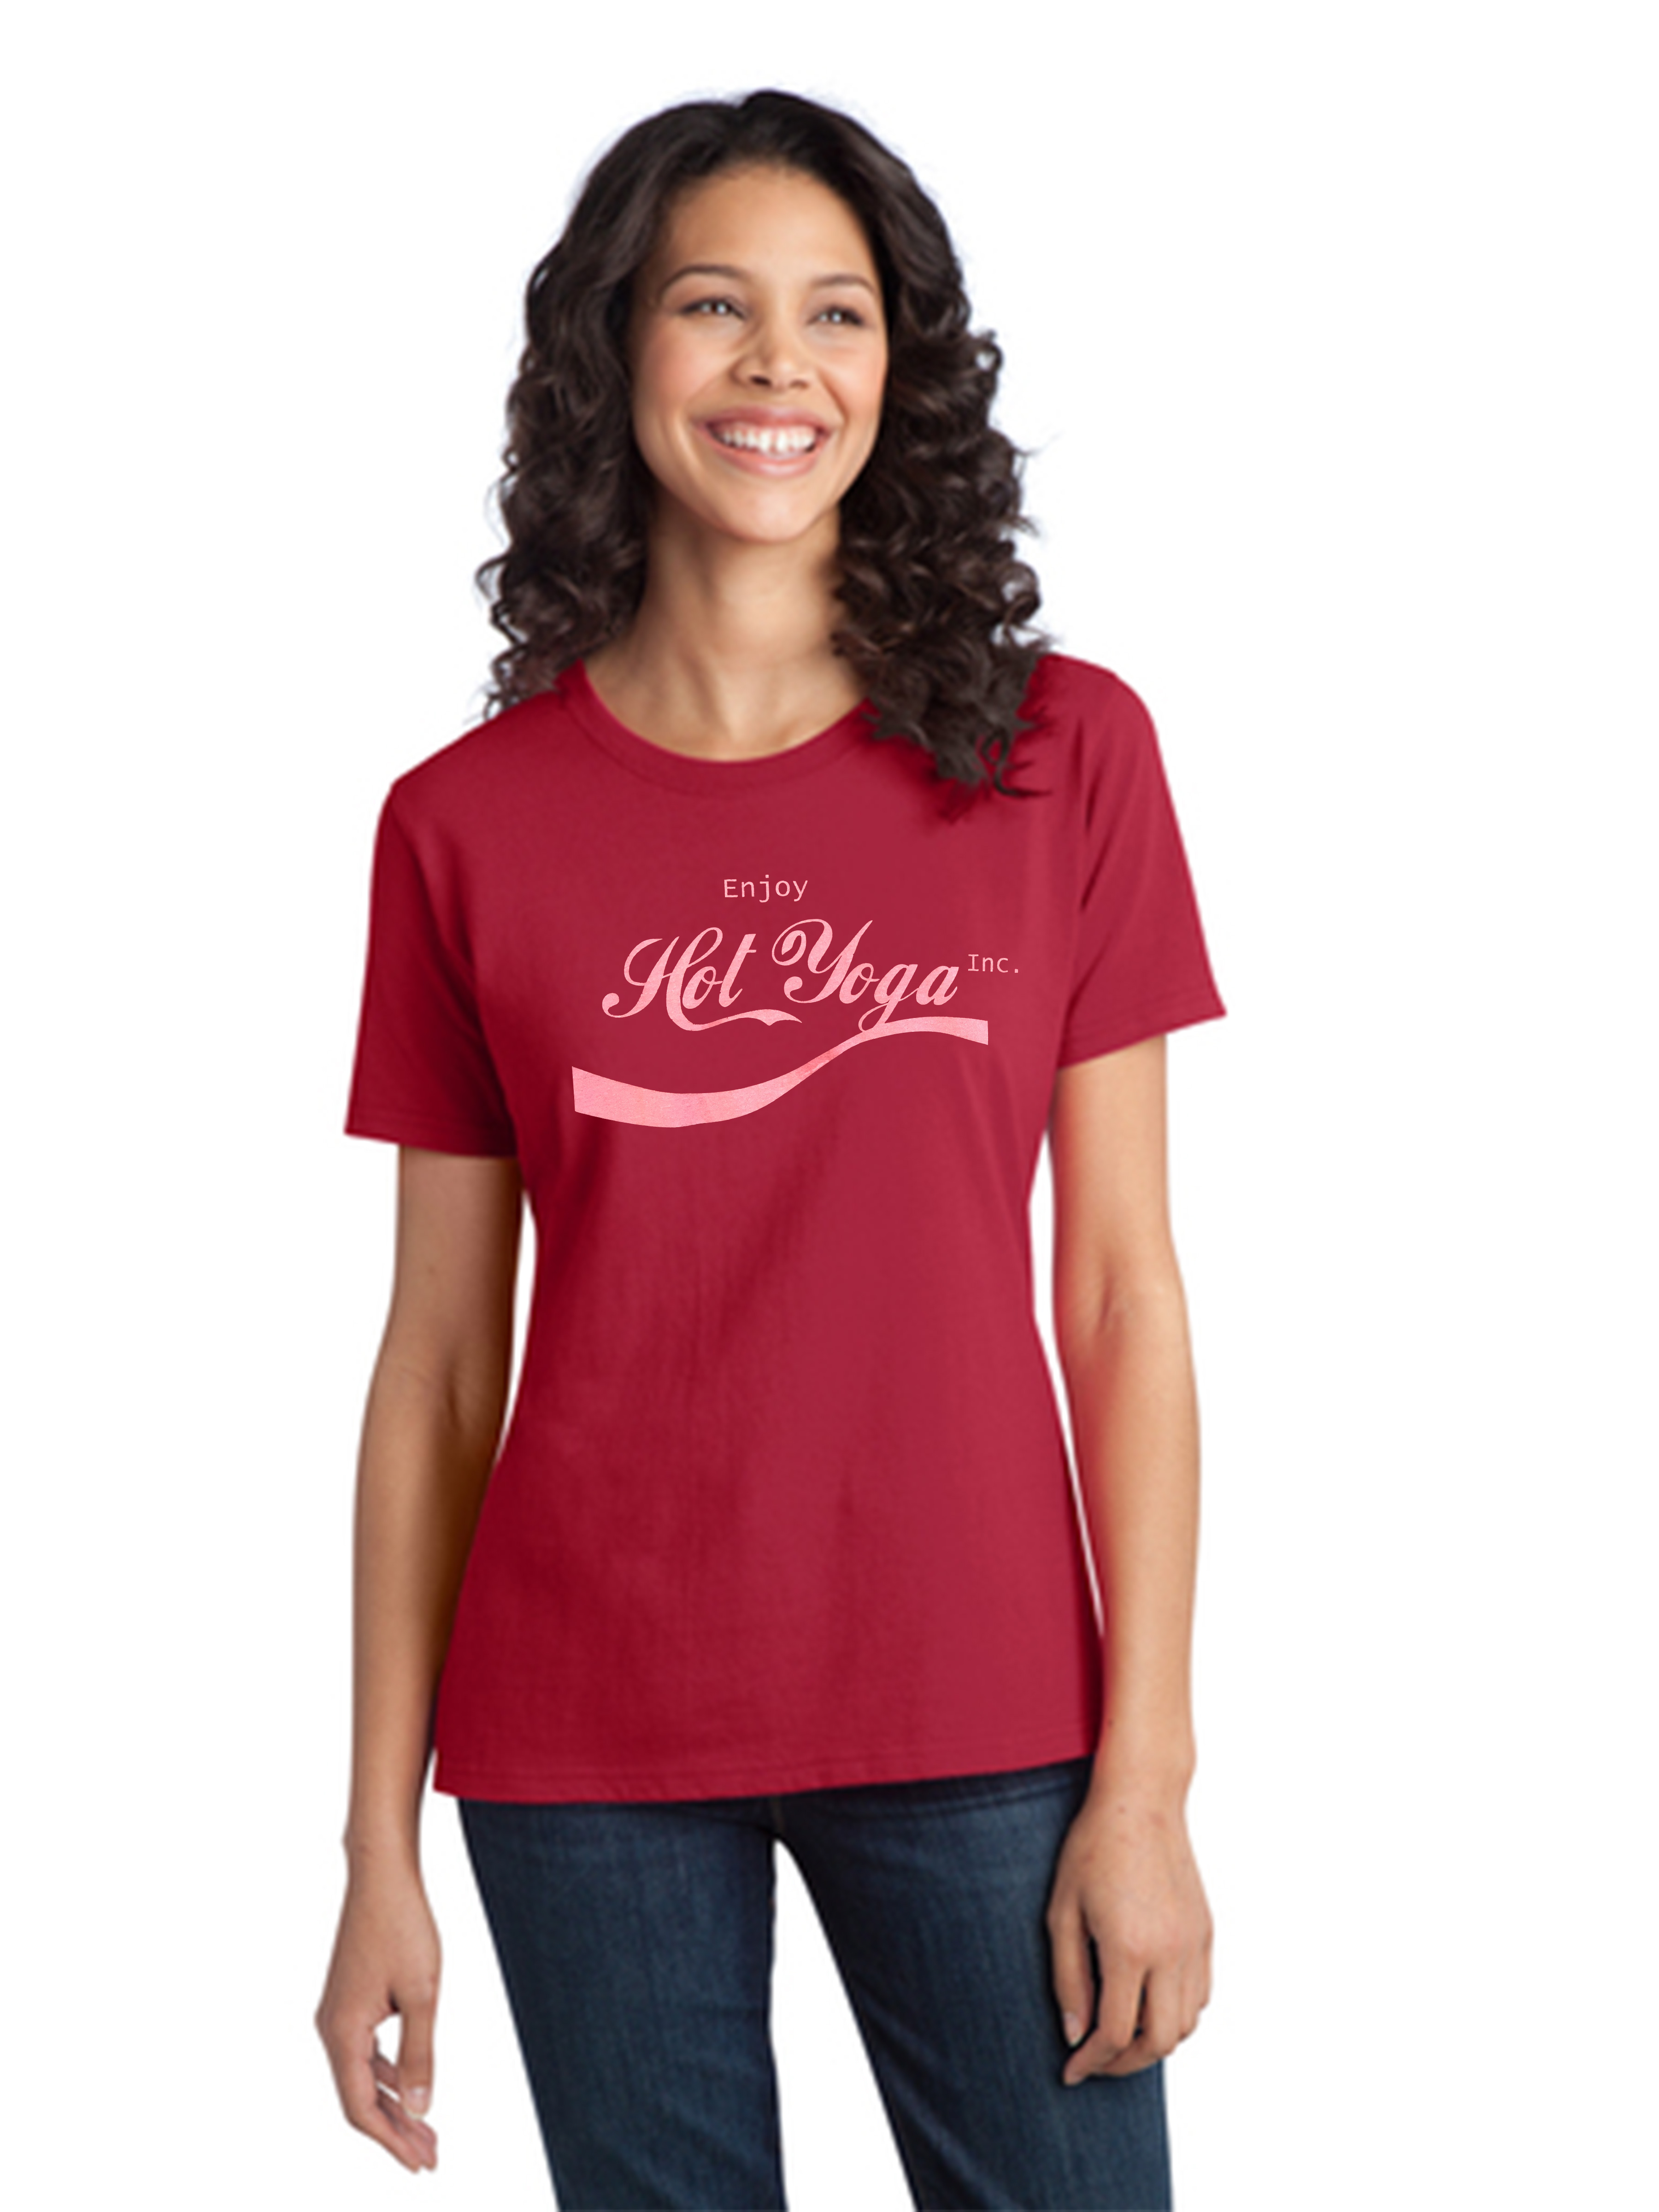 Screen Print Seattle- Seattle T-shirt Screenprinting-Hot Yoga Tee